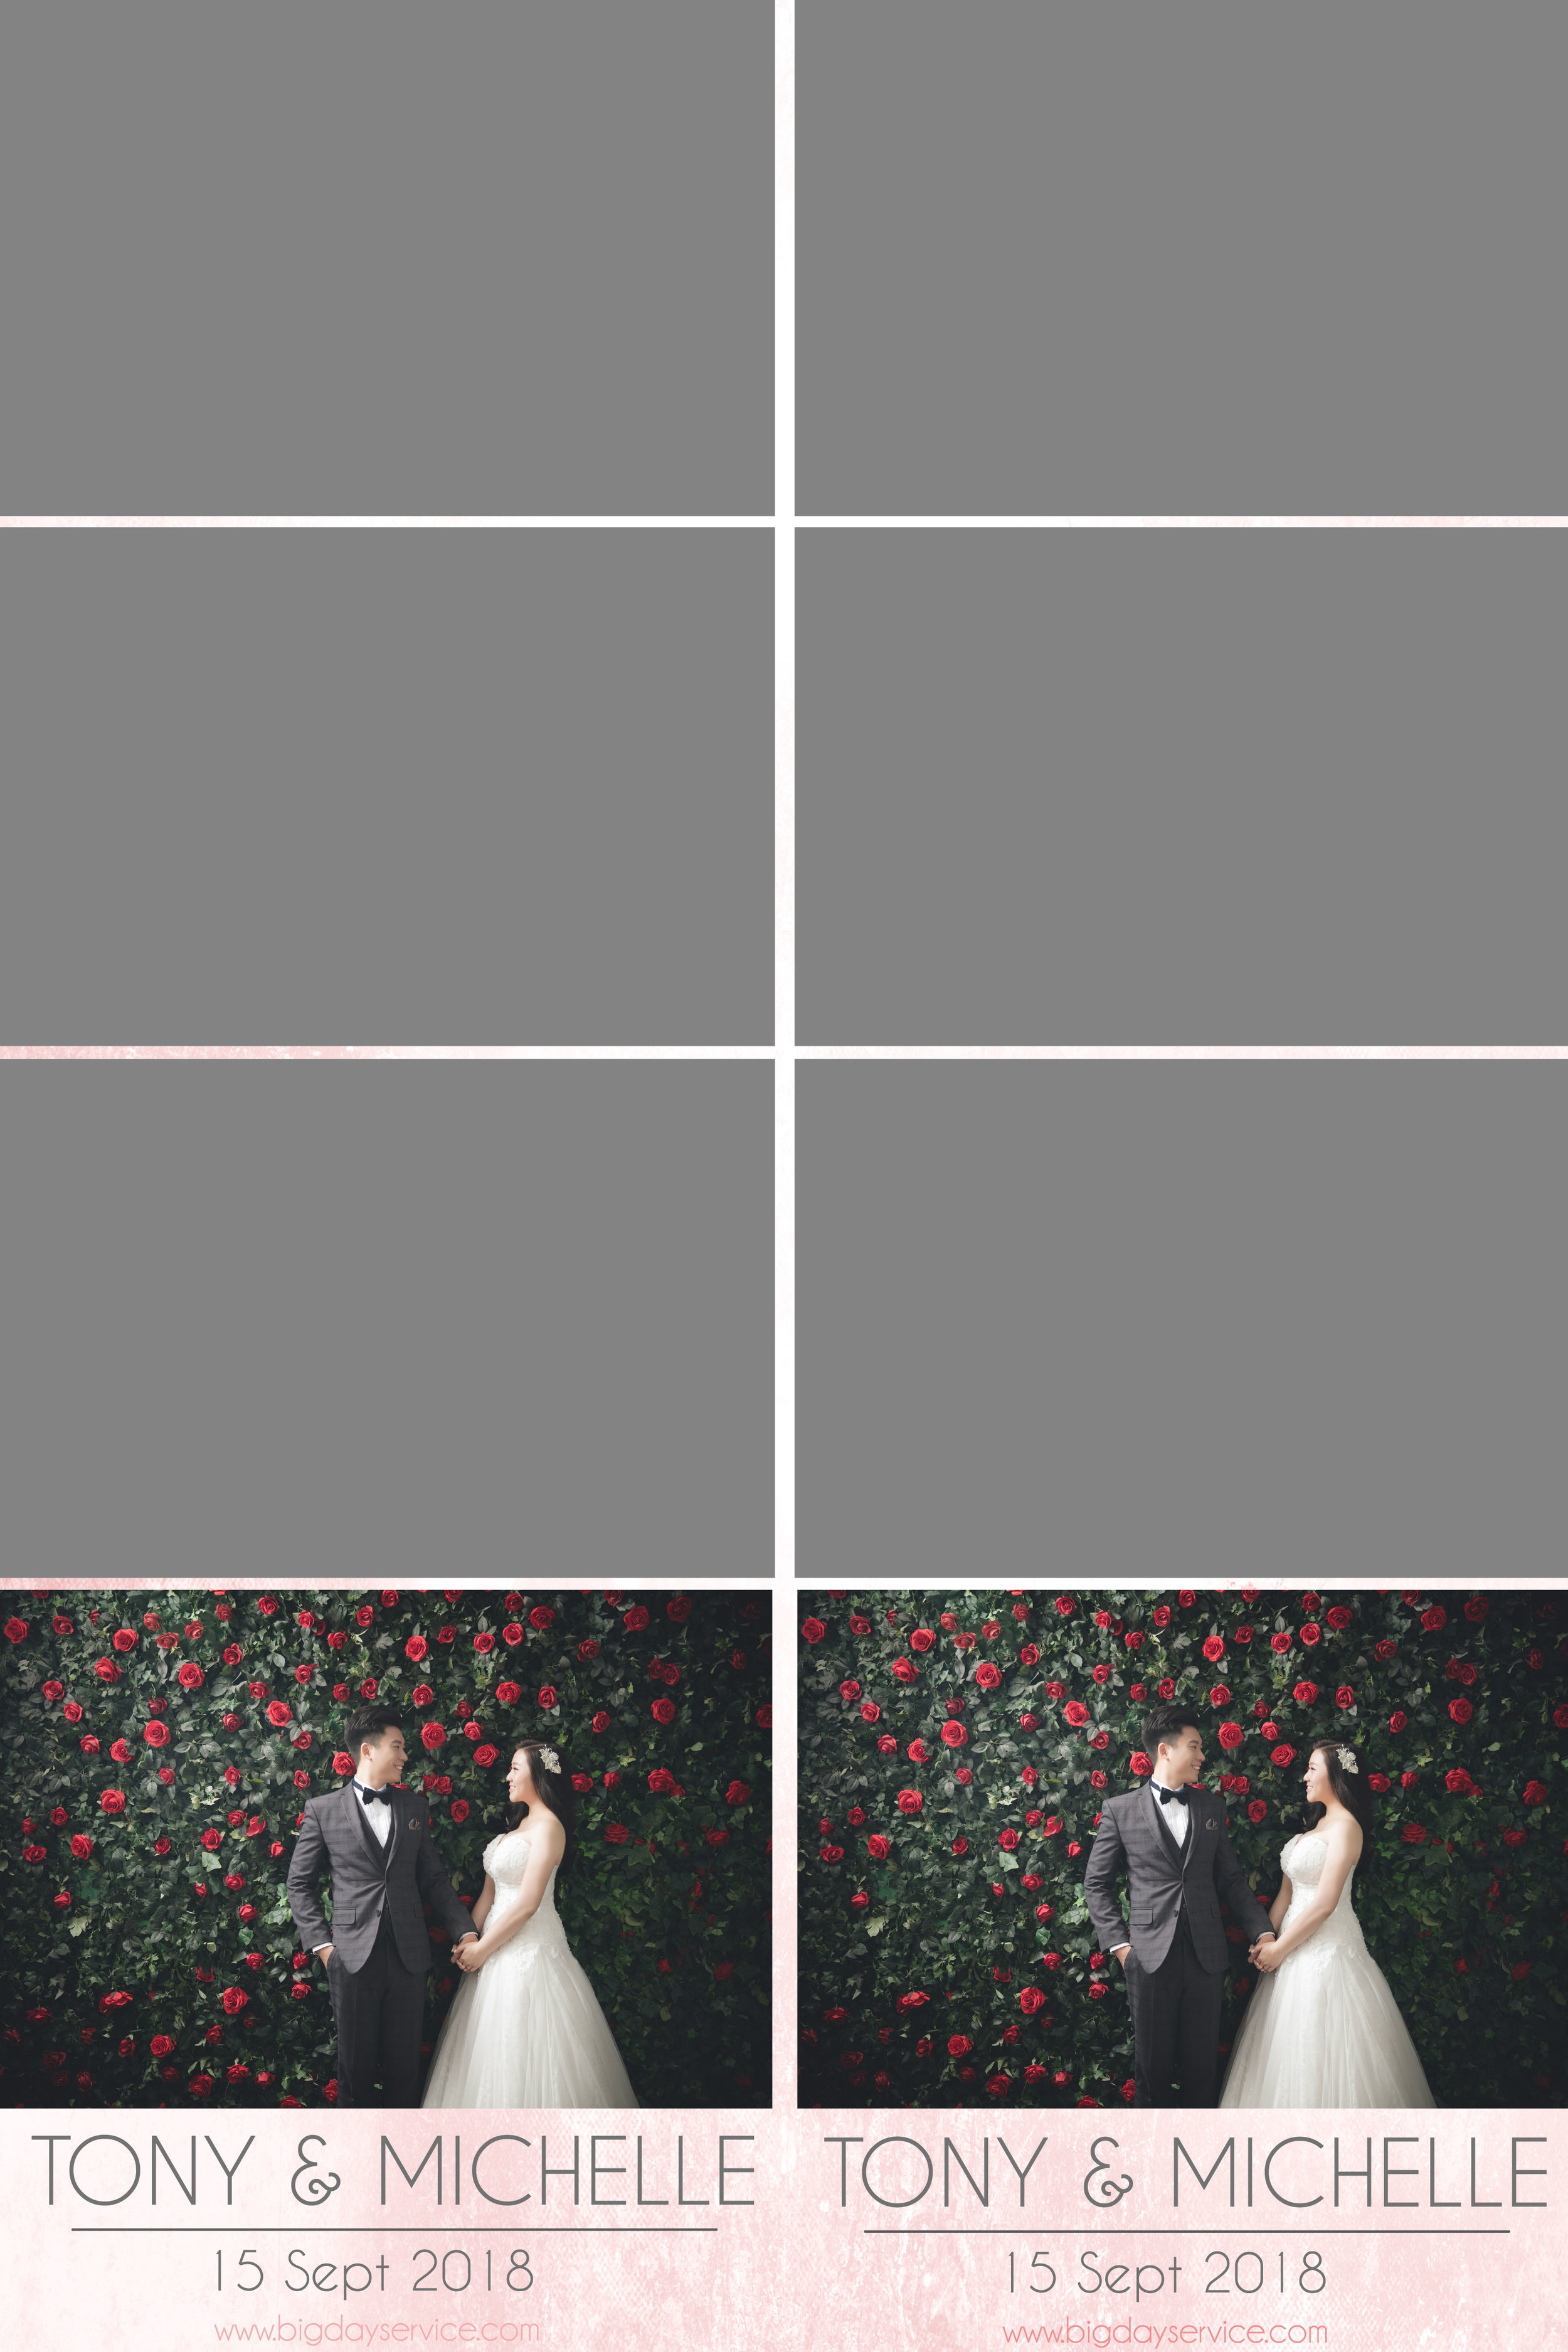 Michelle-&-Tony-Photo-Booth-CAVIAR-DREAM.jpg